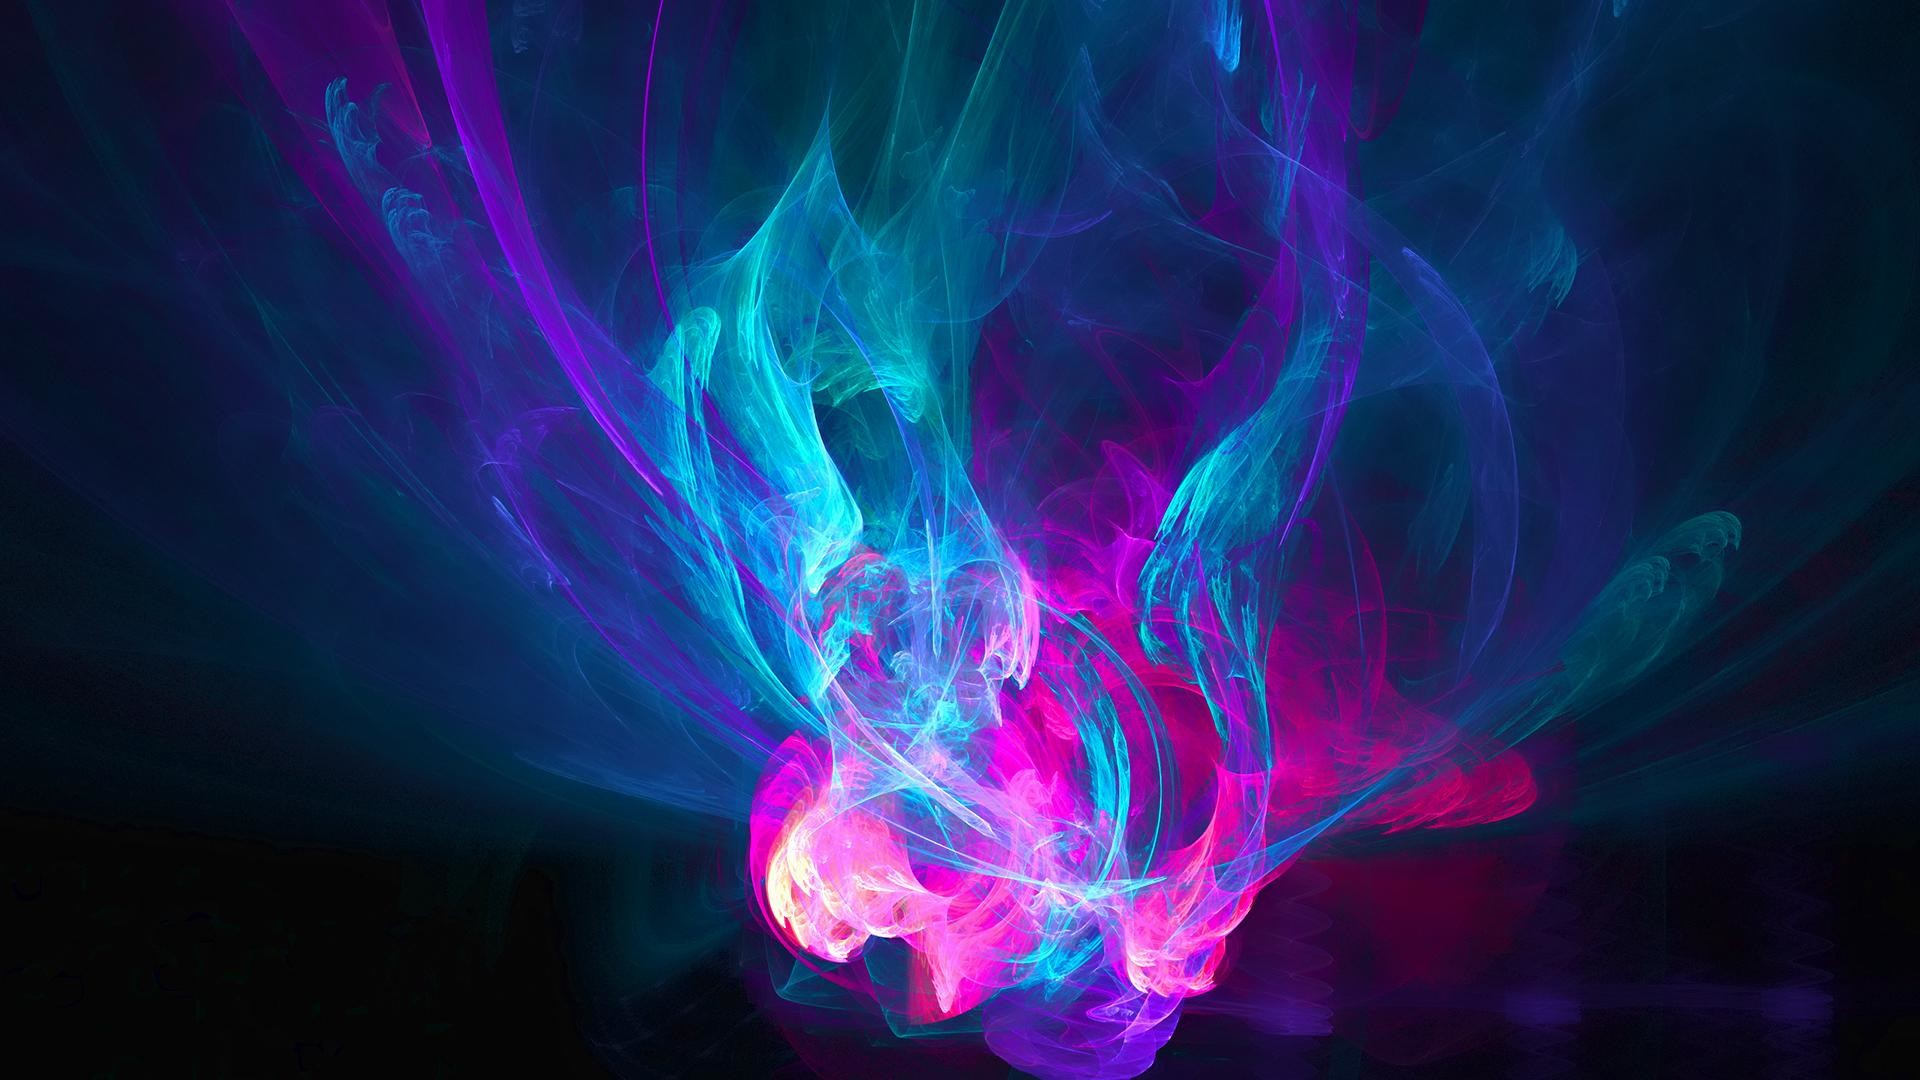 Abstract-fire-pink-blue-purple-patterns-HD-wallpaper